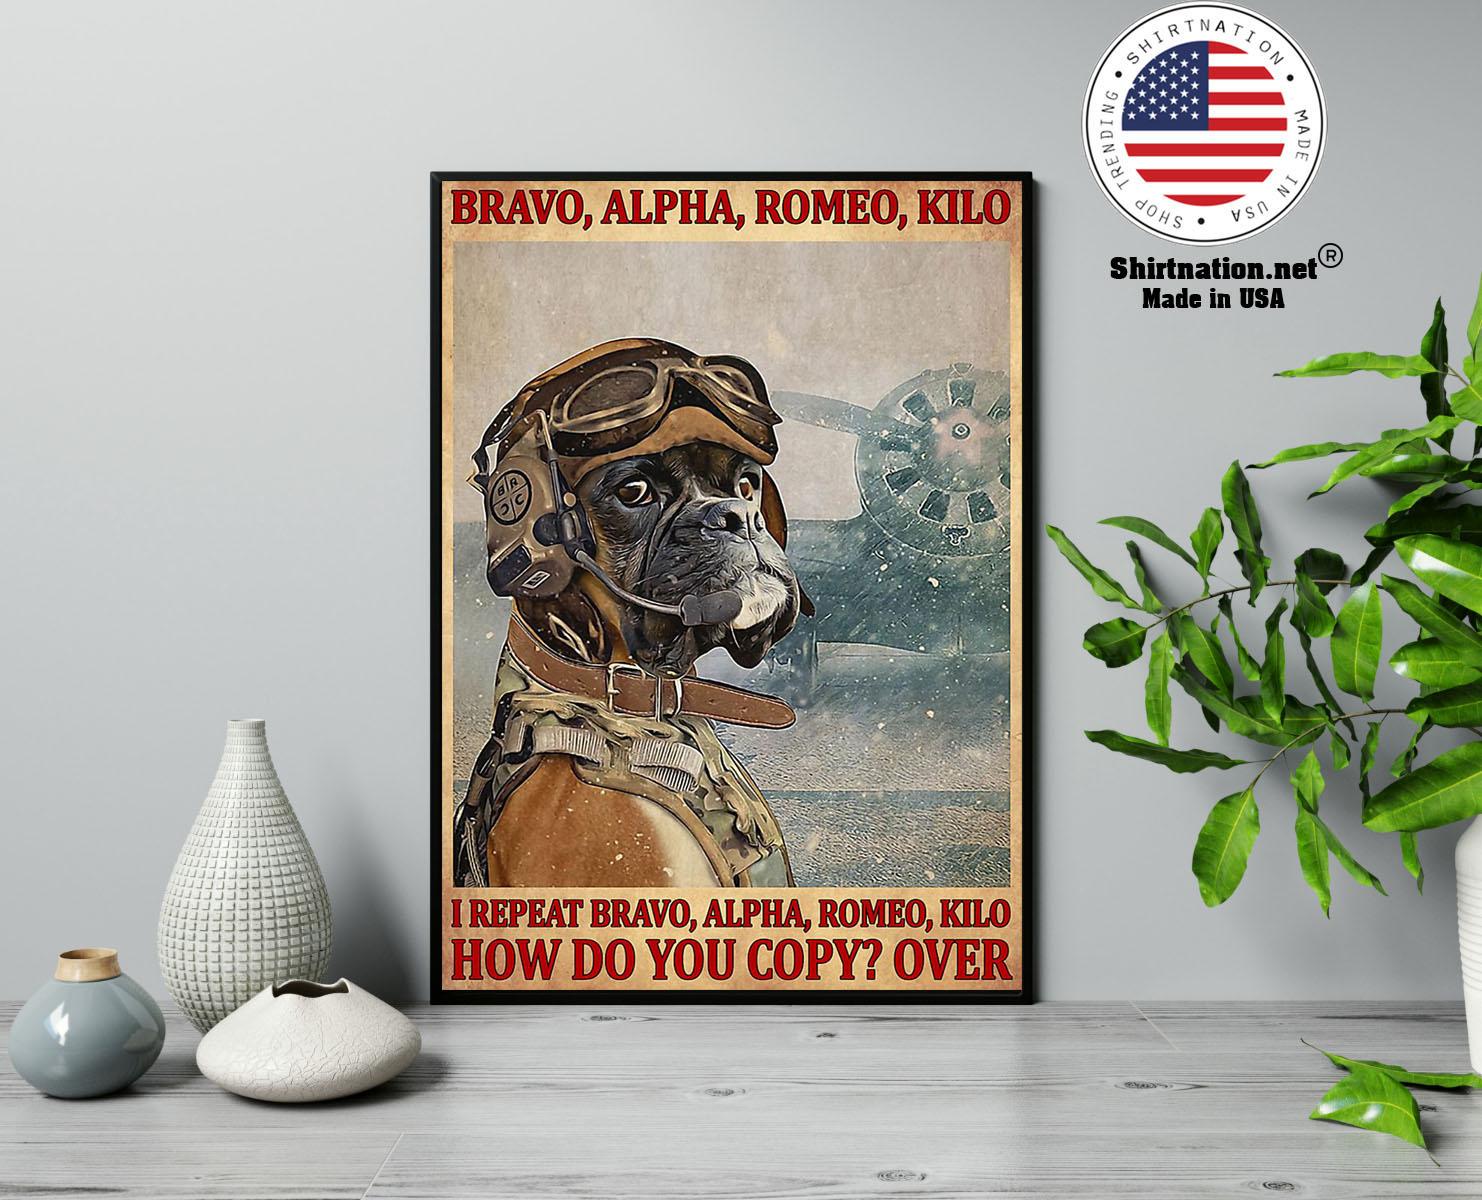 Bravo alpha romeo kilo I repeat bravo alpha romeo kilo how do you copy over poster 13